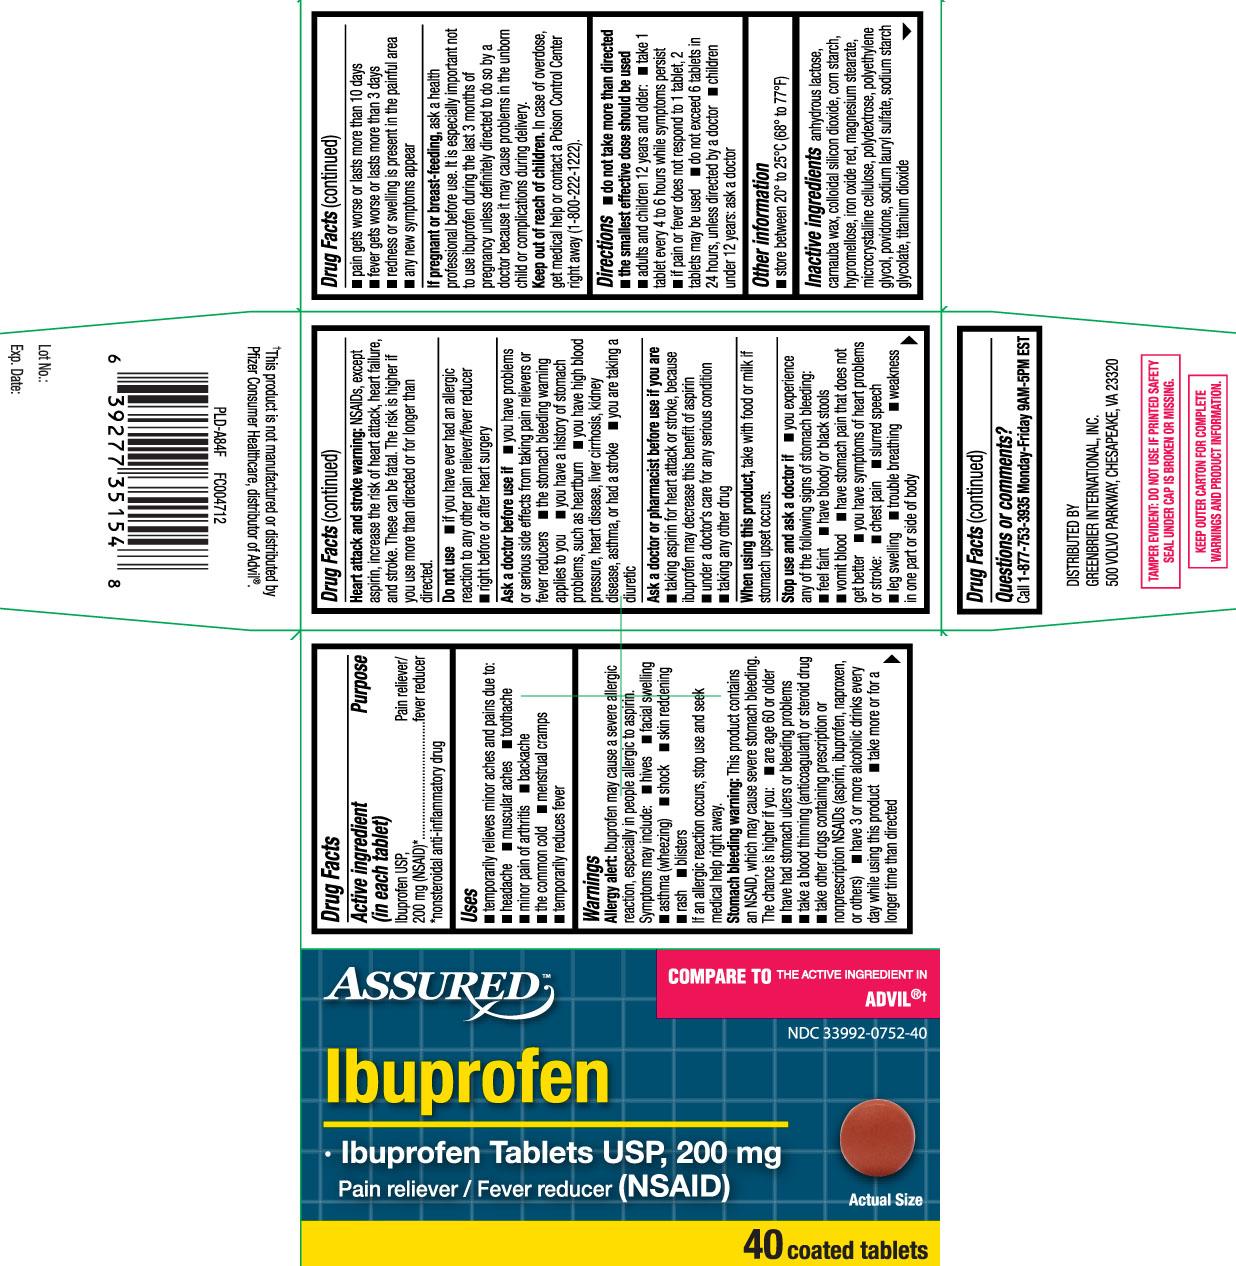 Ibuprofen USP, 200 mg (NSAID)* *nonsteroidal anti-inflammatory drug